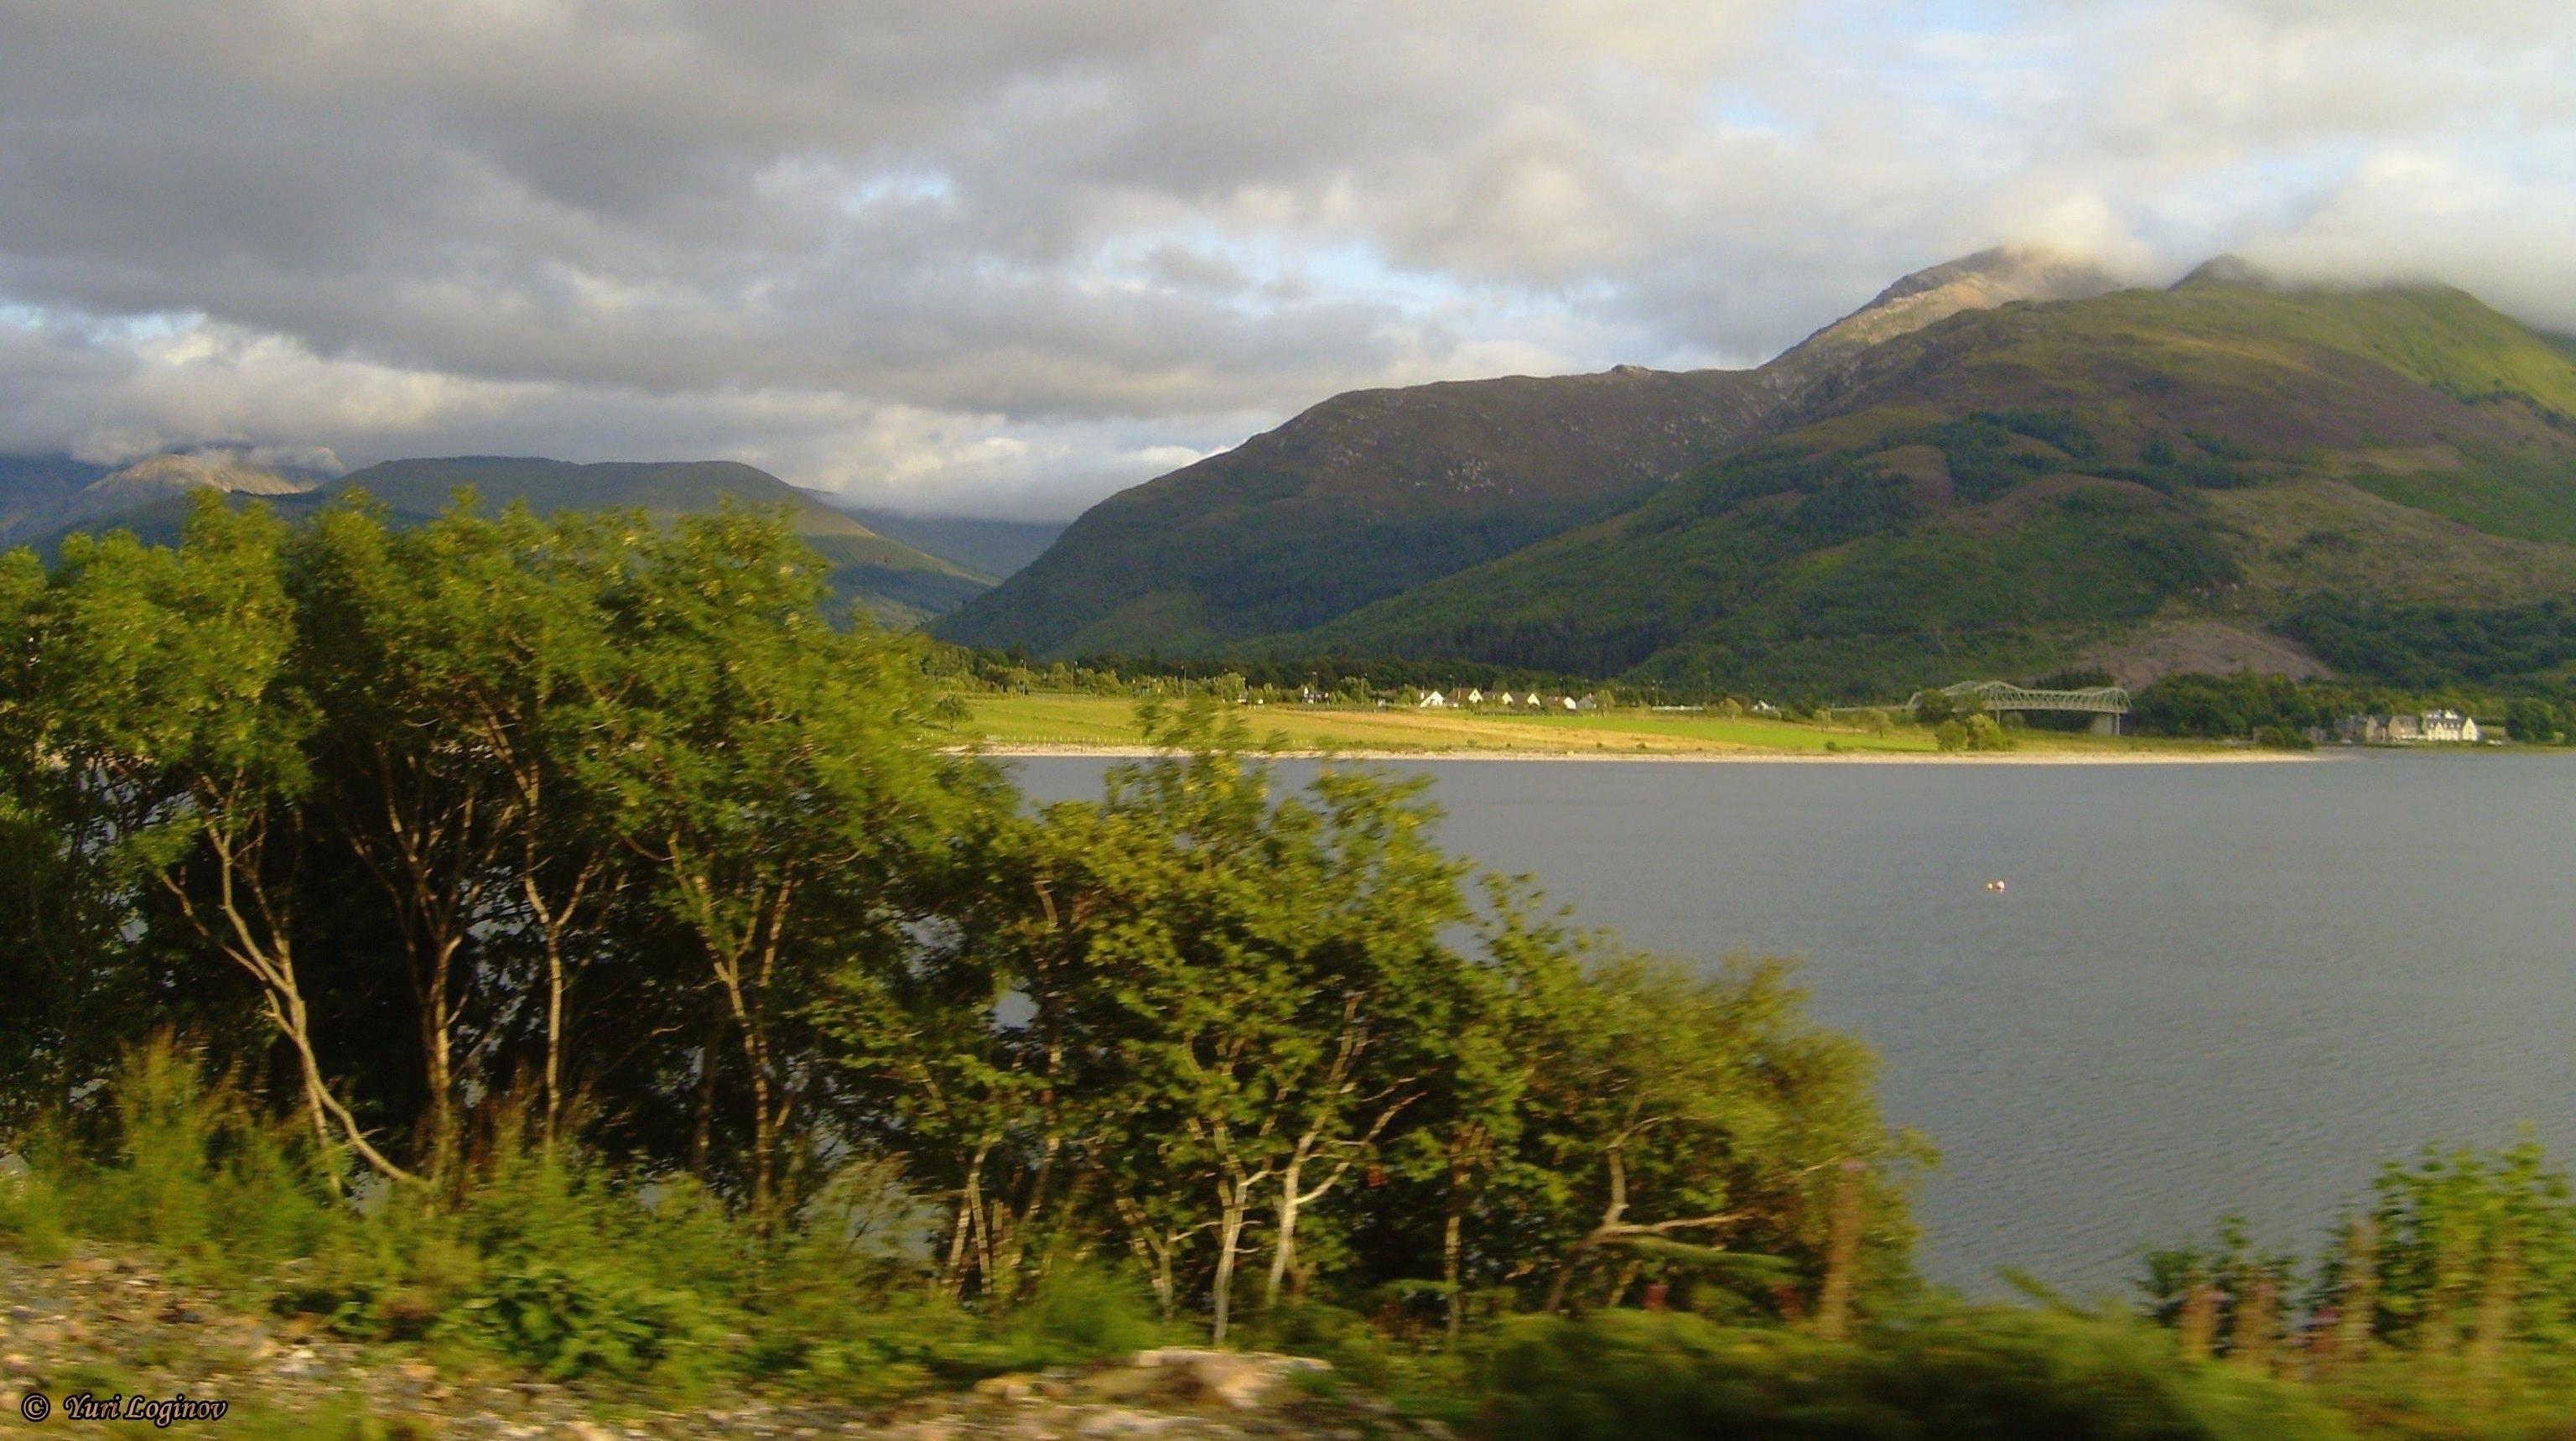 Free stock photo of scotland, united kingdom, Grampian Mountains